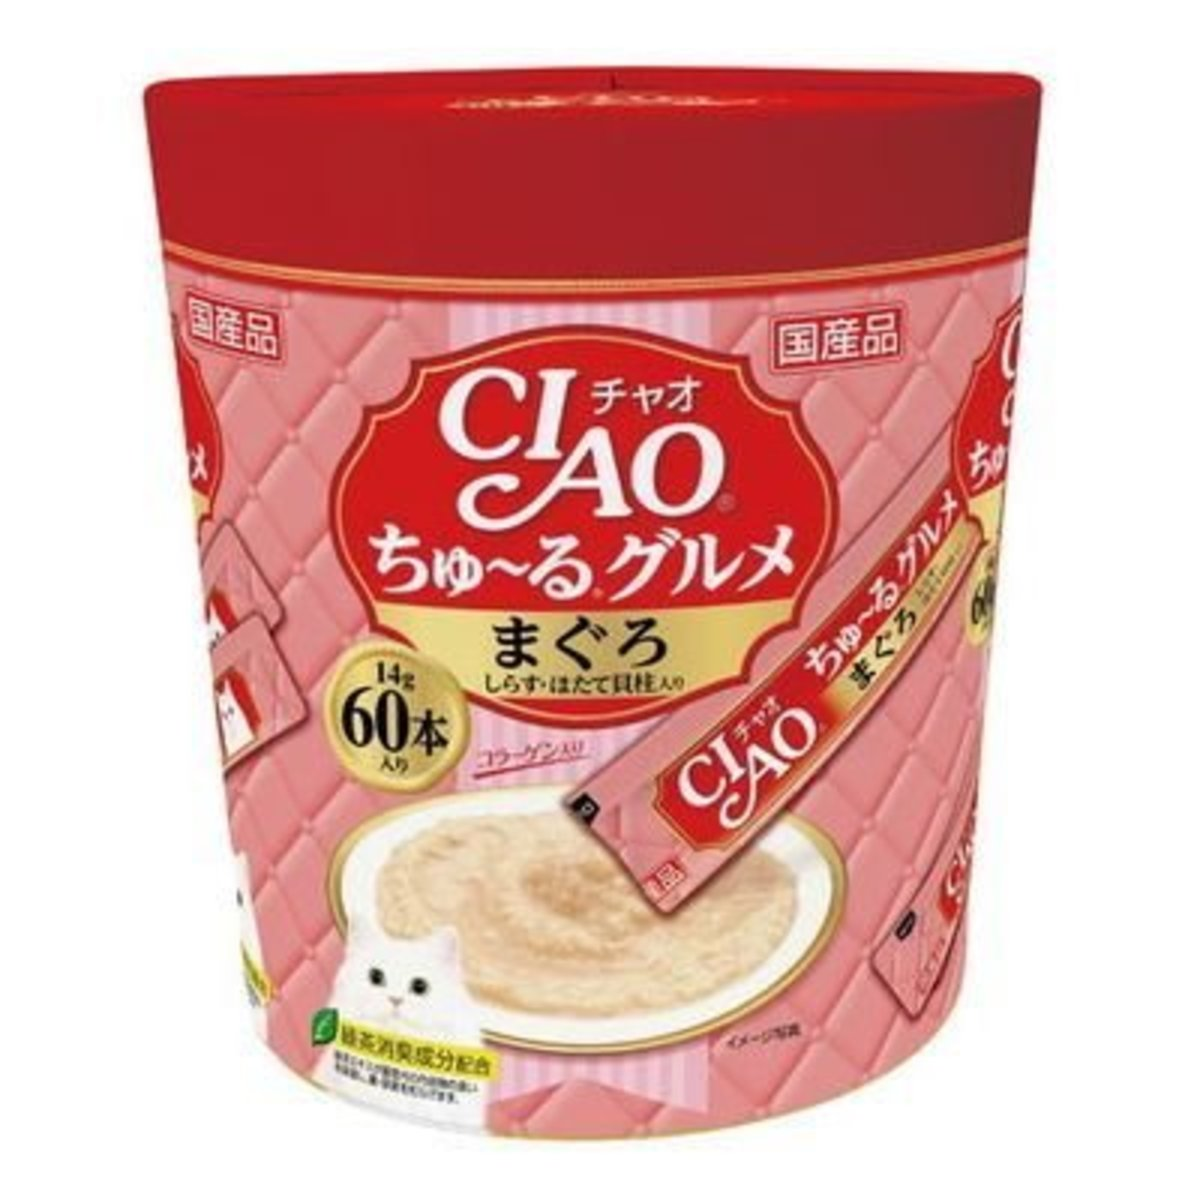 CIAO Churu Cat Food Treat Paste Party Mix - Tuna Whitebait Scallop 14g x60p [Pink]